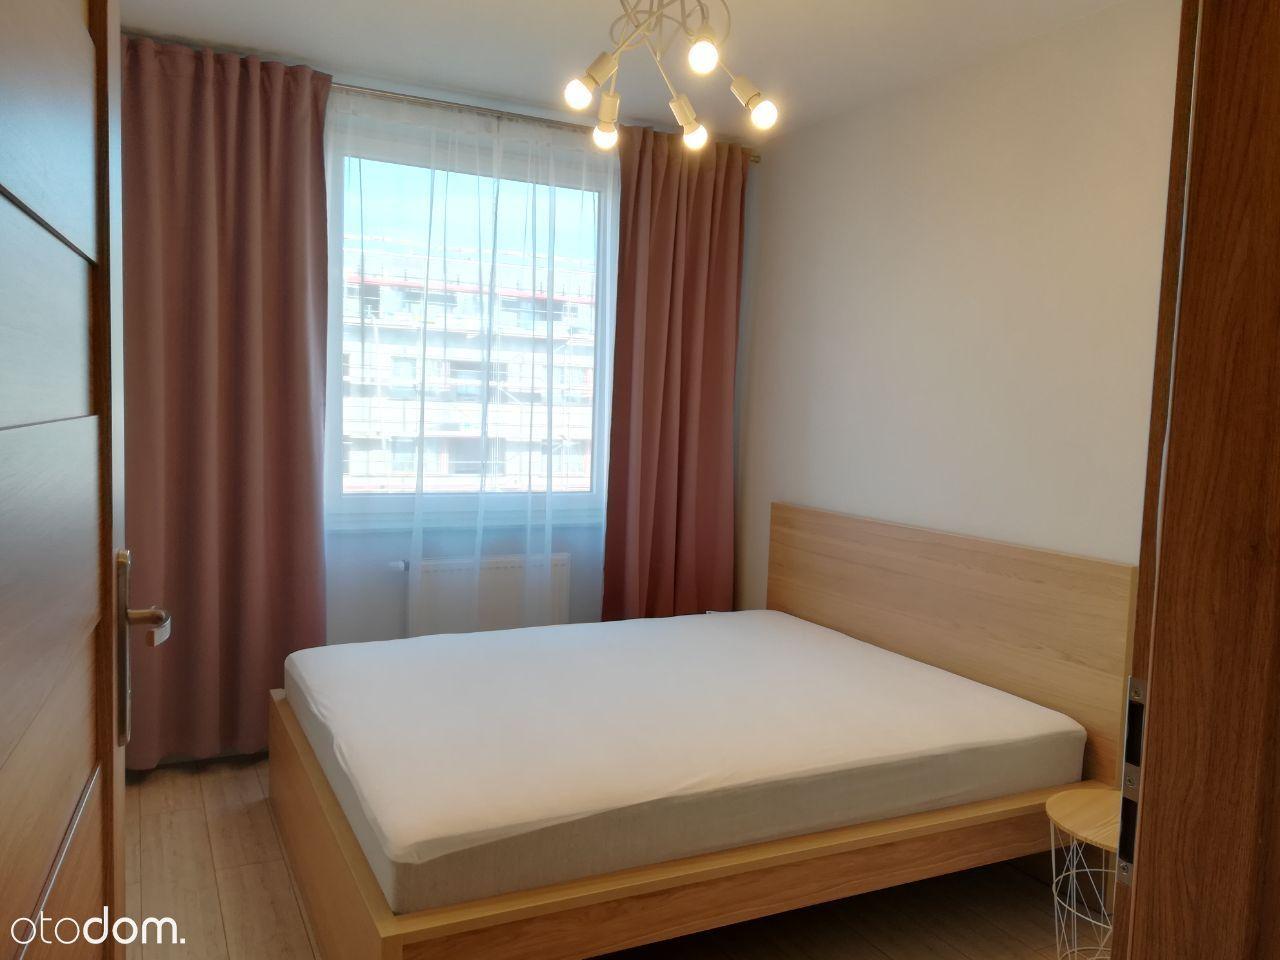 Nowe i ciche, 2 pokoje 45m2, kuchnia, loggia ENG